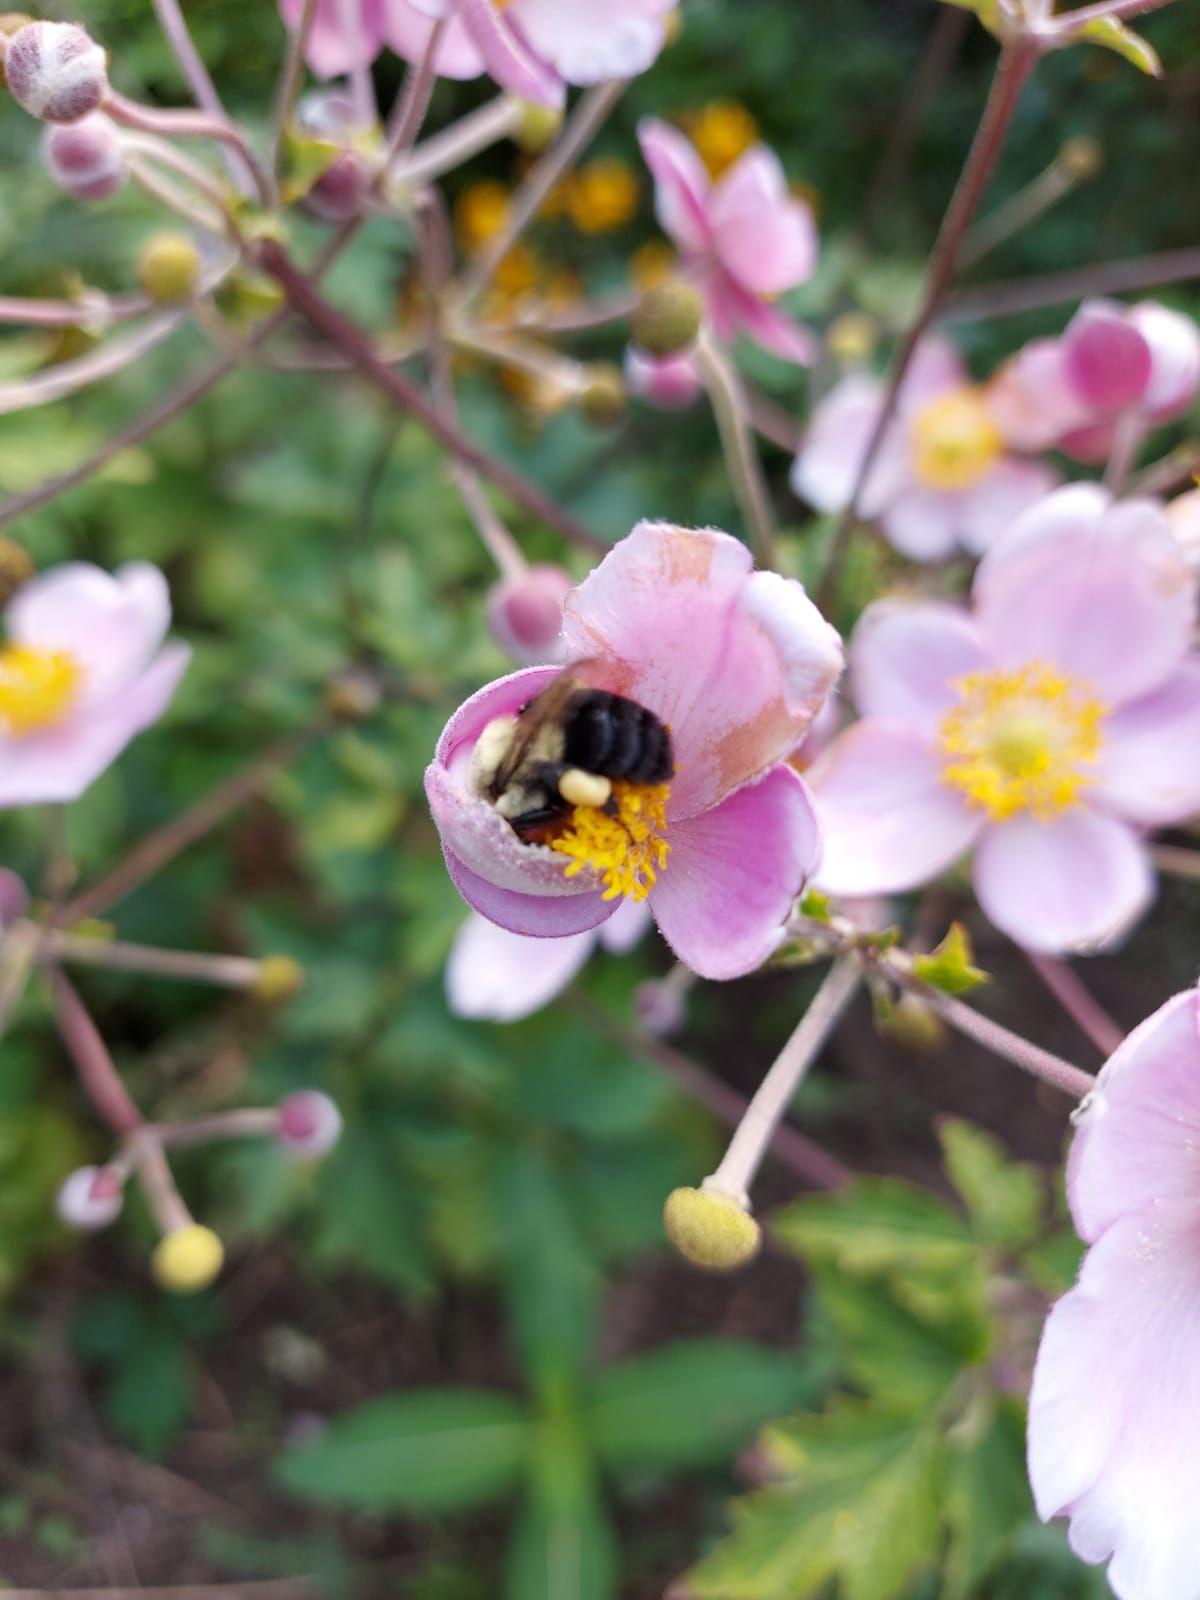 Bee In An Anemone Flower In 2020